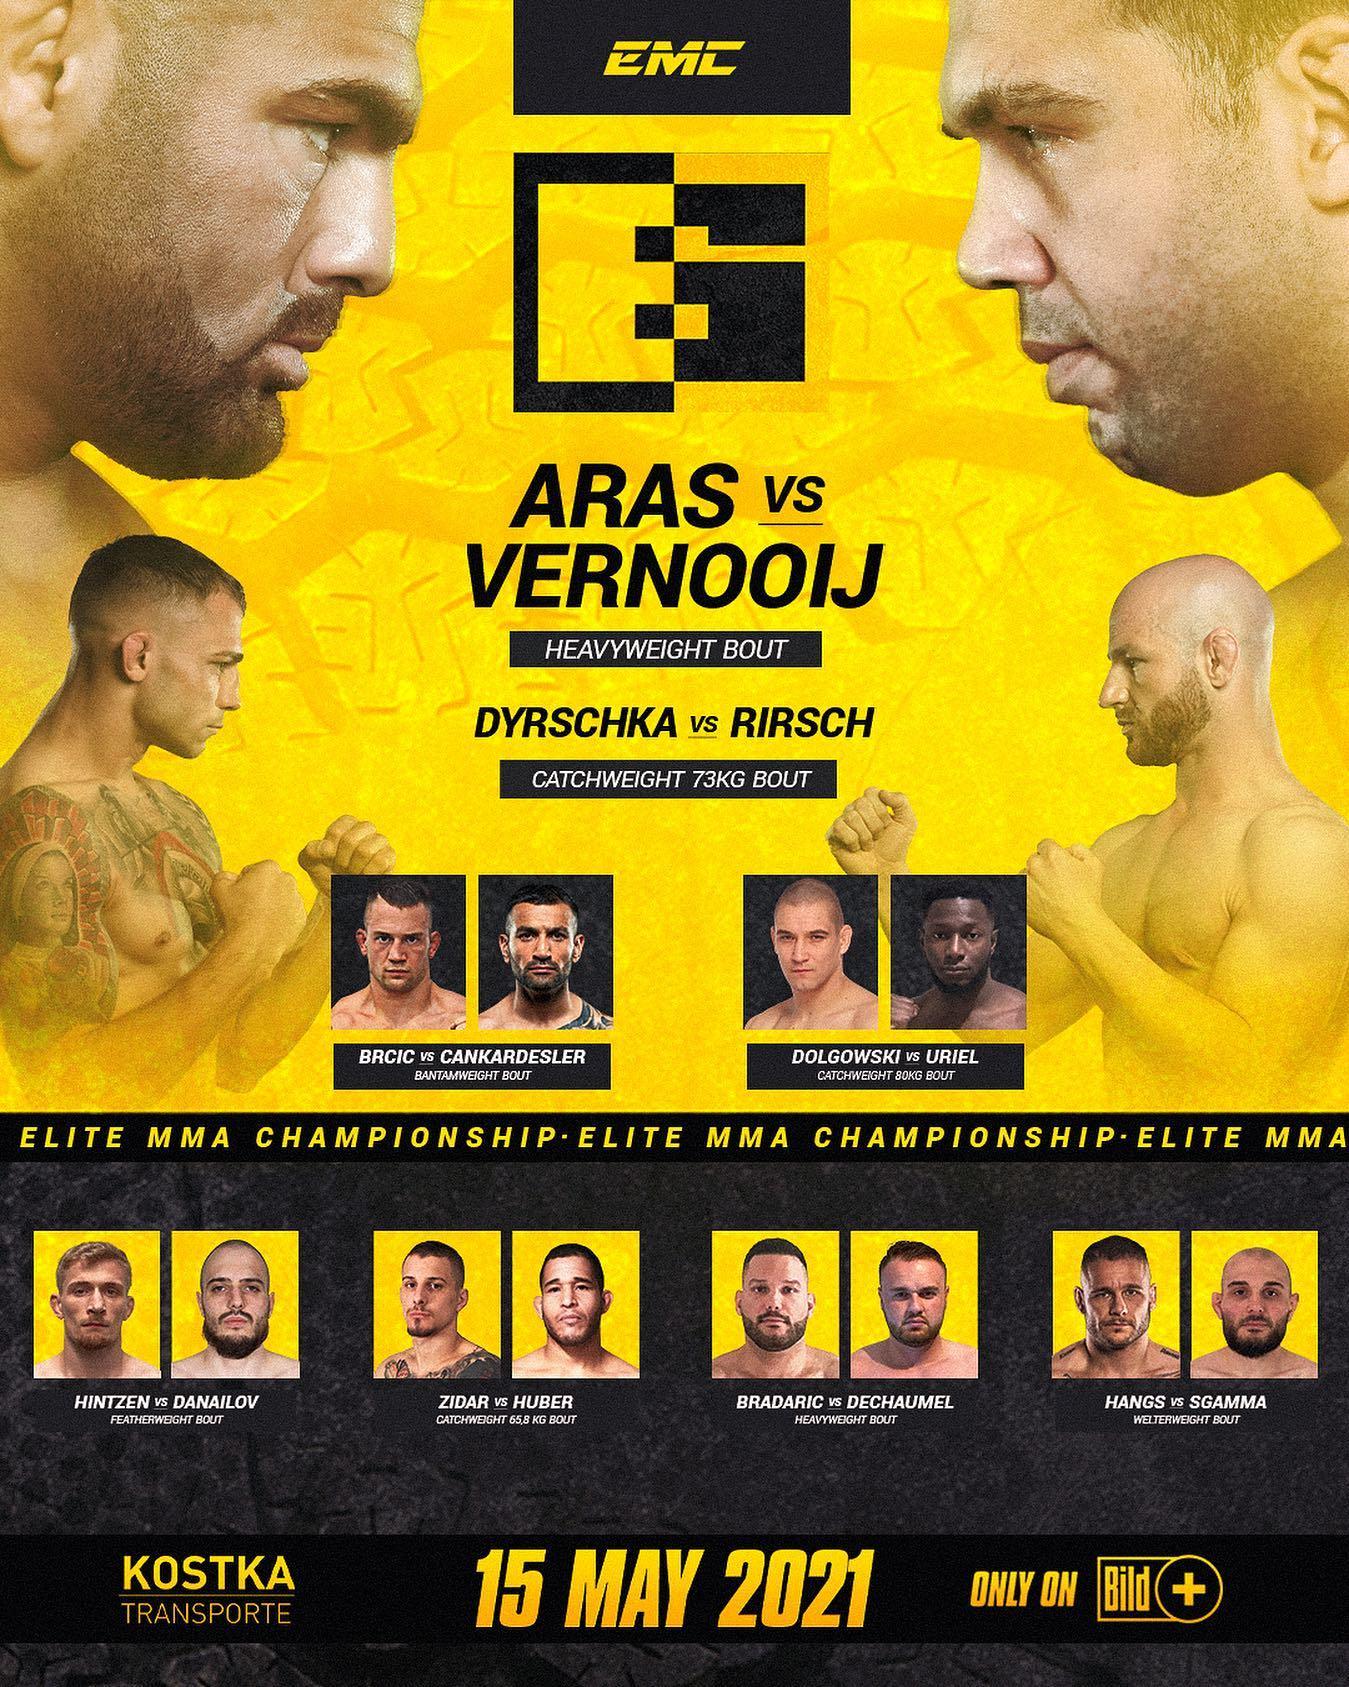 EMC 6 - Elite MMA Championship 6 - EMC6